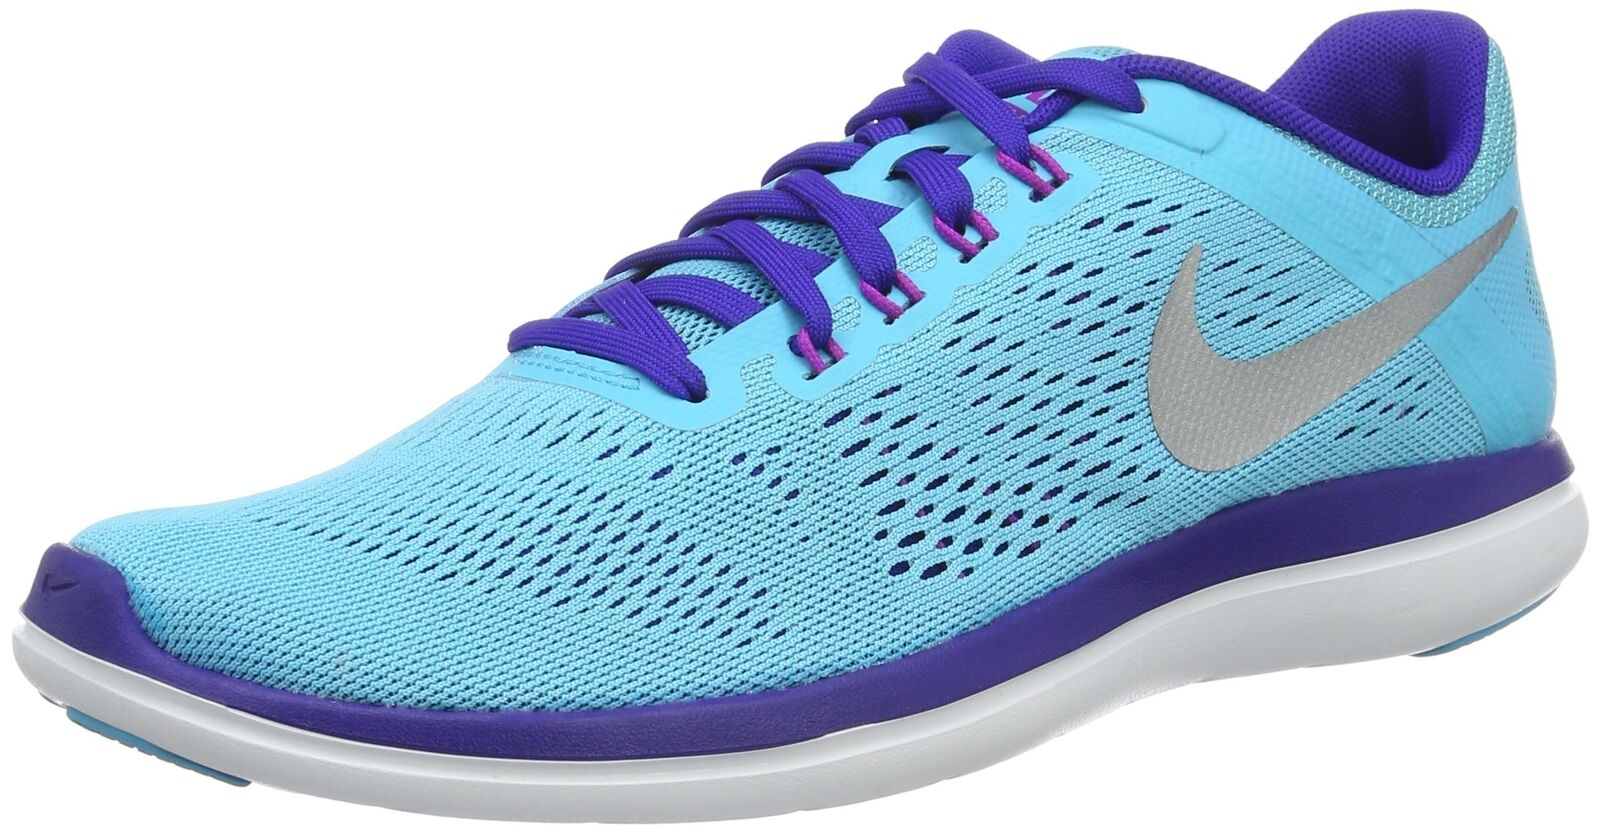 NIKE Women's Flex 2016 Rn Running shoes Gamma bluee Metallic Silver Concord sz 9